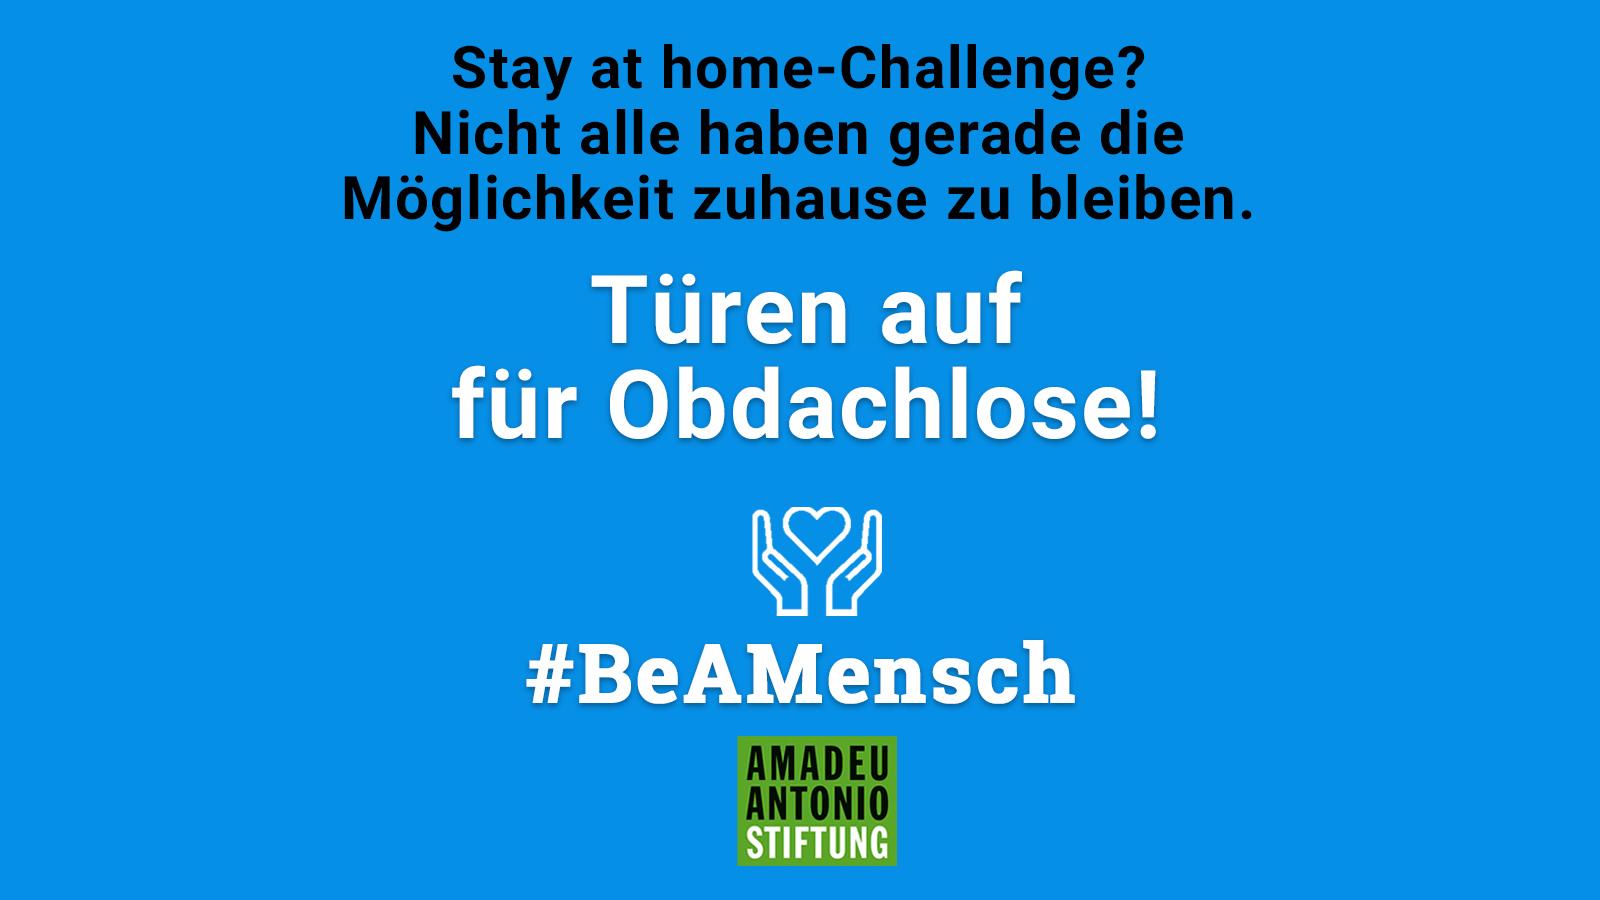 Beamensch-Obdachlose-16_9